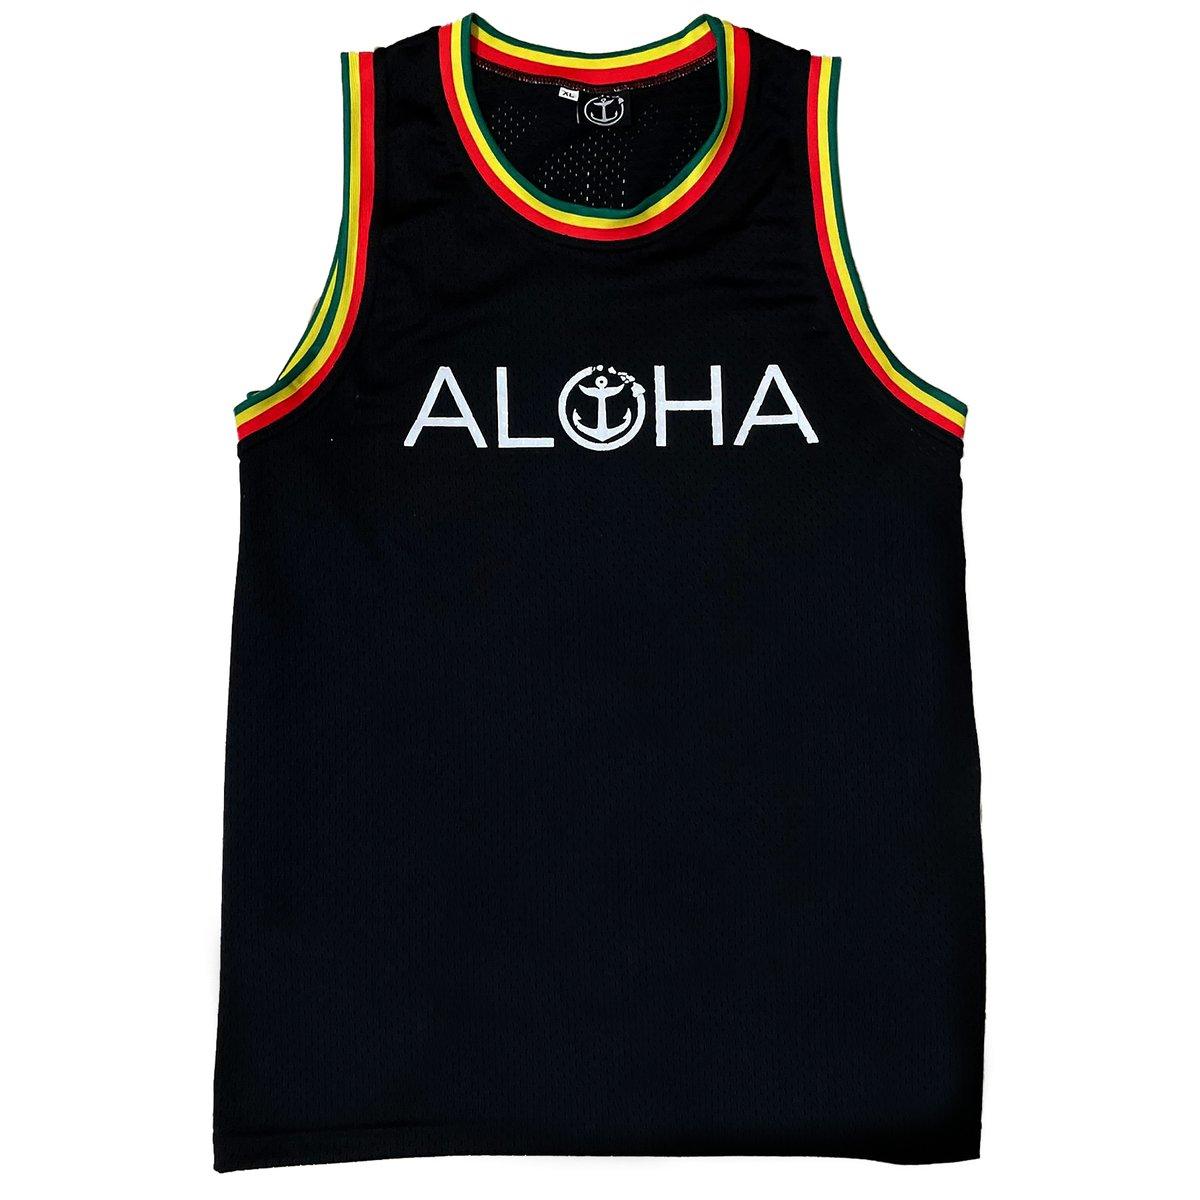 Aloha Beach! Jersey - BLK-R